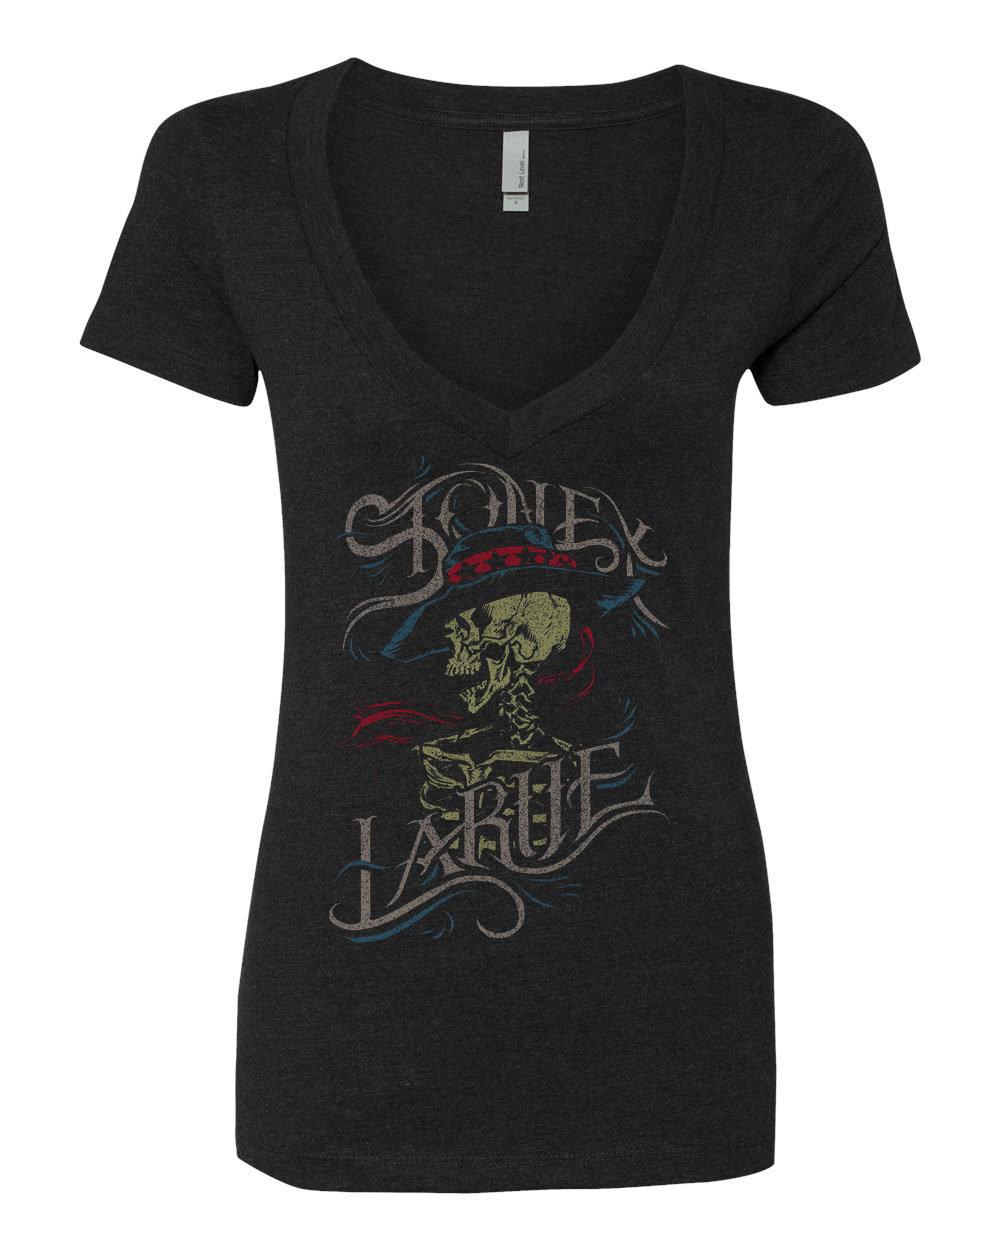 Cowboy Skull T-Shirt (Female)